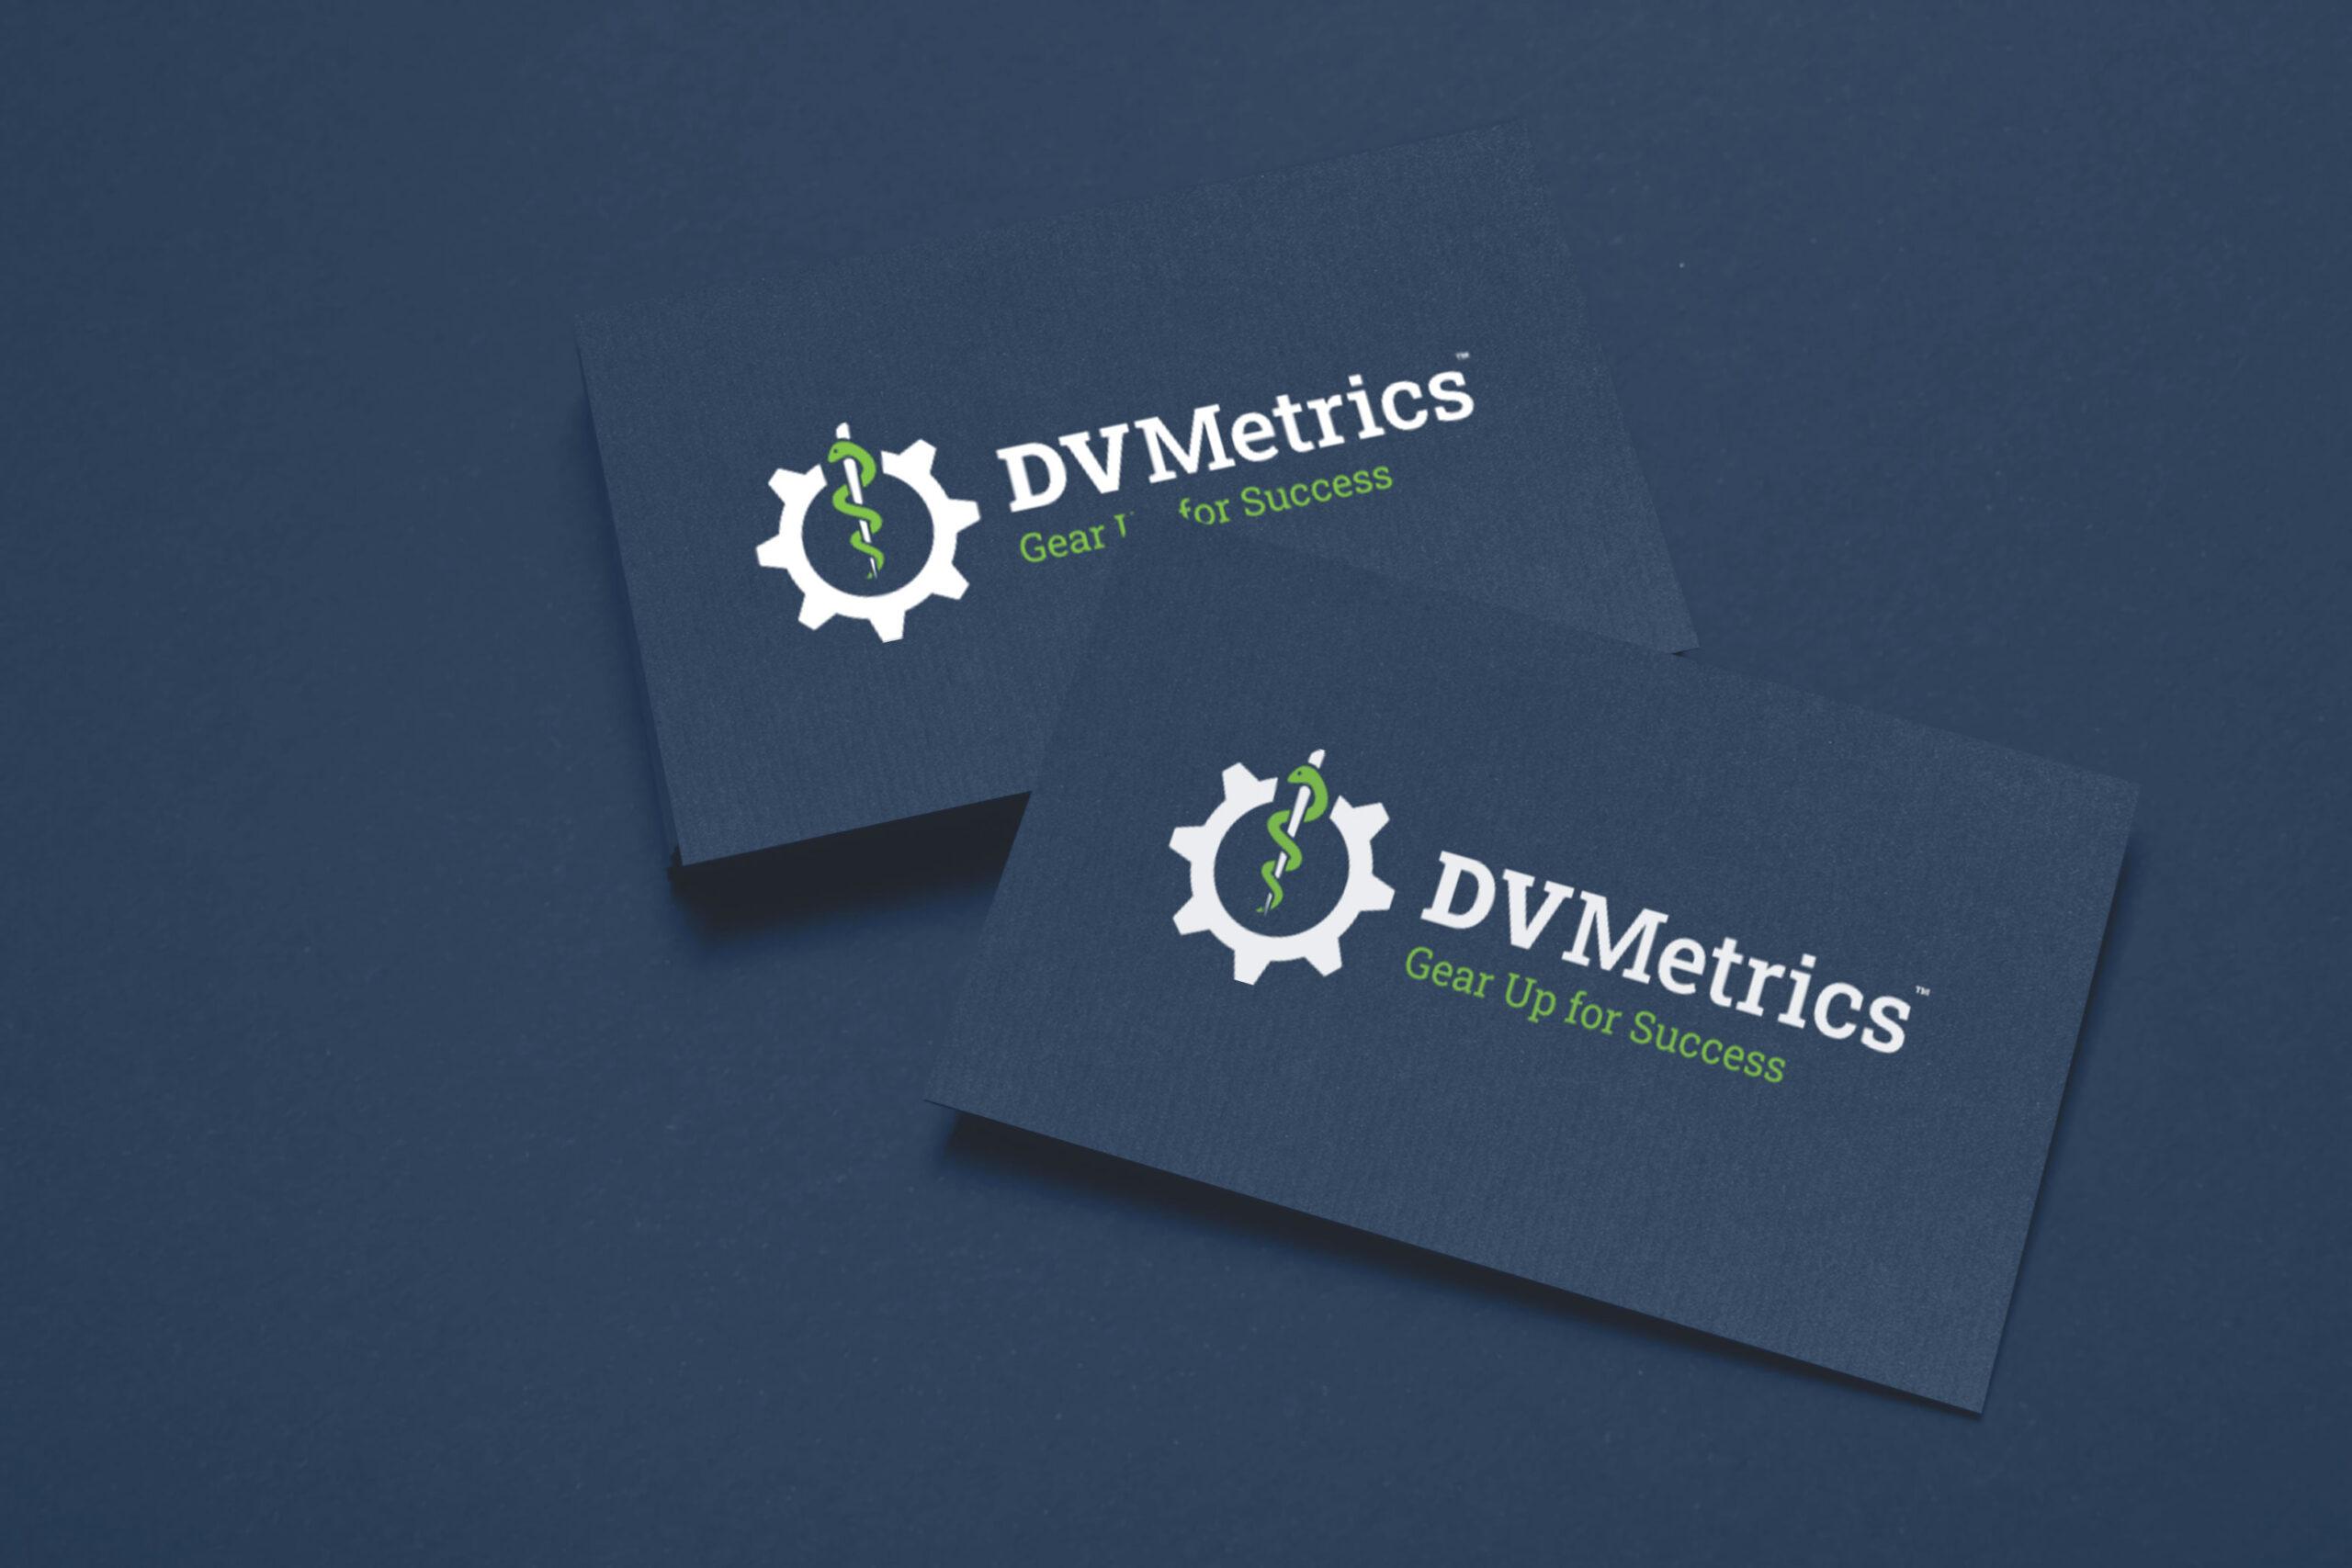 DVMetrics Business Cards